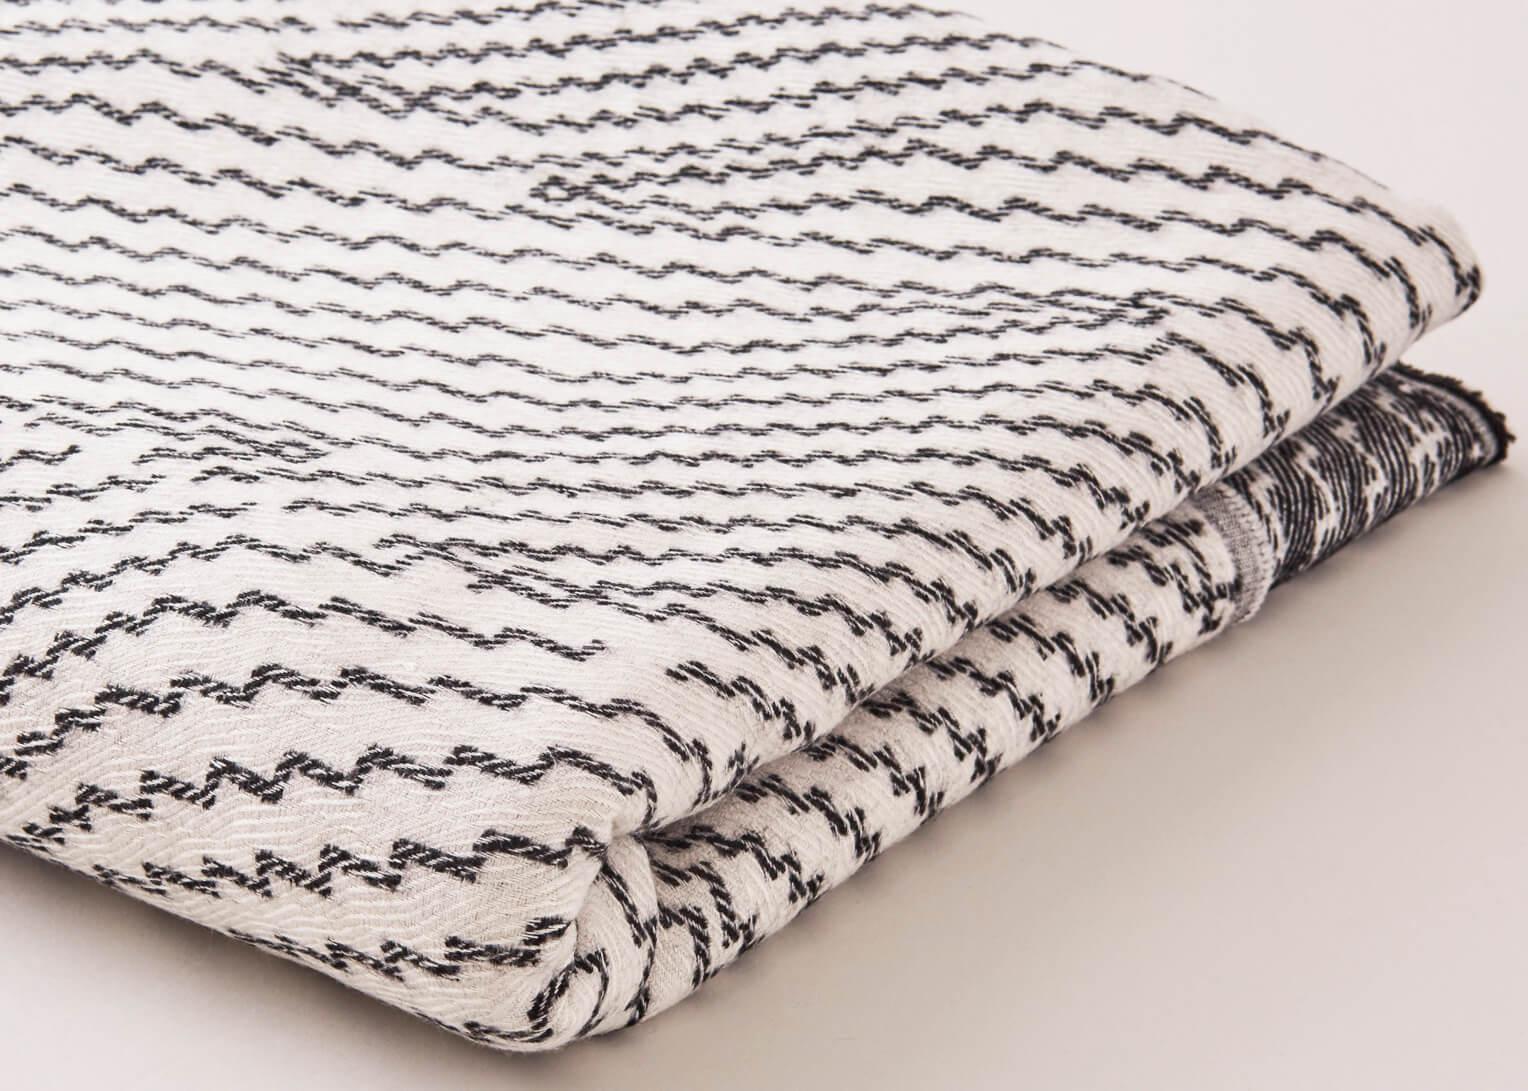 Beatrice Larkin Step Throw - Light version of this pattern